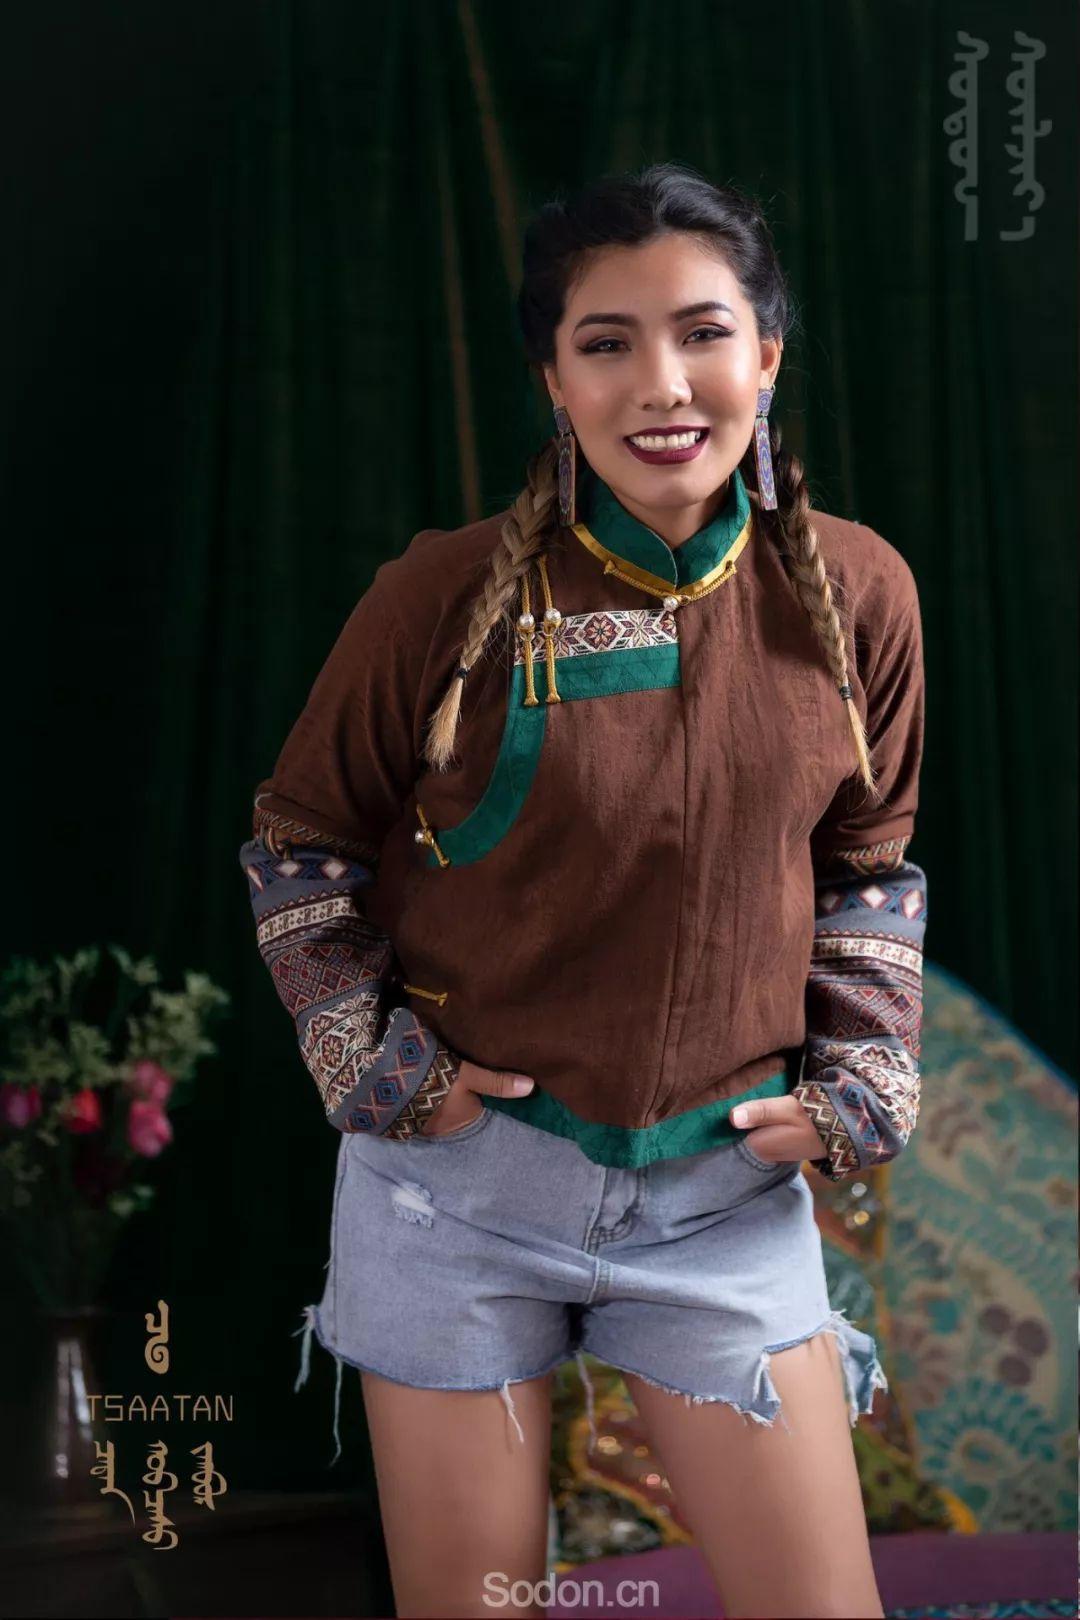 TSAATAN蒙古时装秋冬系列,来自驯鹿人的独特魅力! 第41张